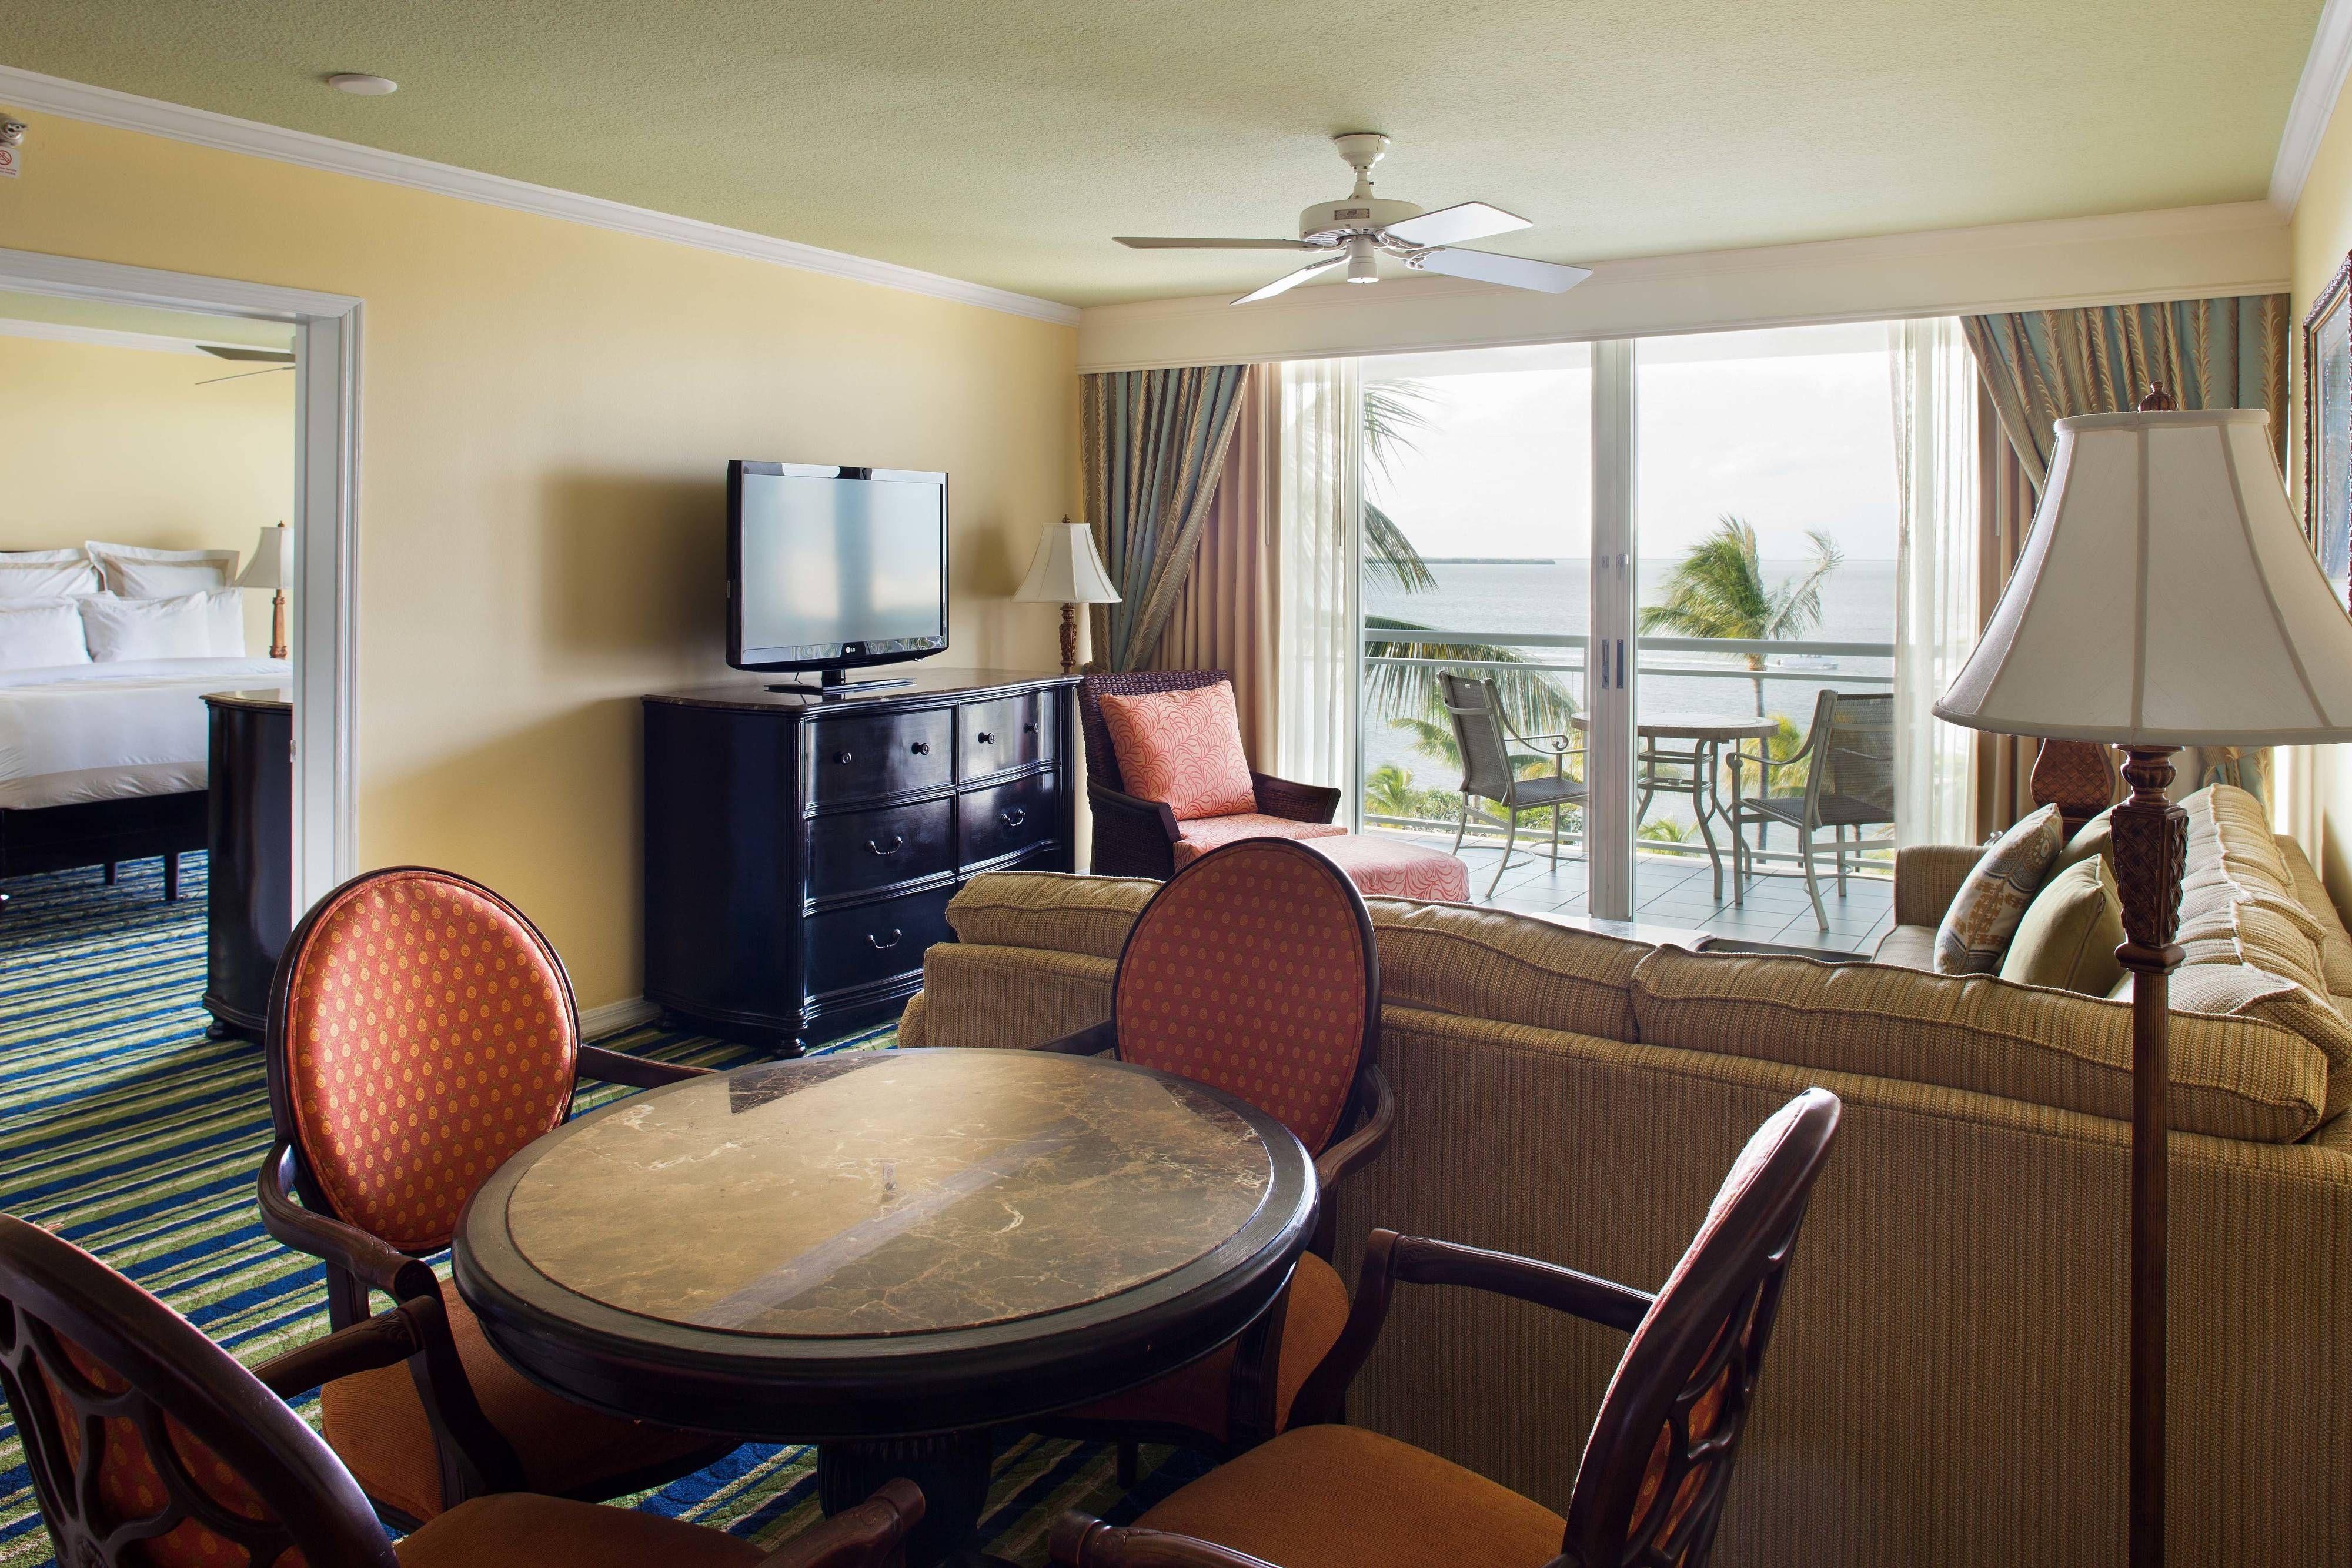 Key Largo Bay Marriott Beach Resort Two Bedroom Suite Living Room Guestroom Holiday Relax Key Largo Marriott Two Bedroom Suites Key Largo Fl